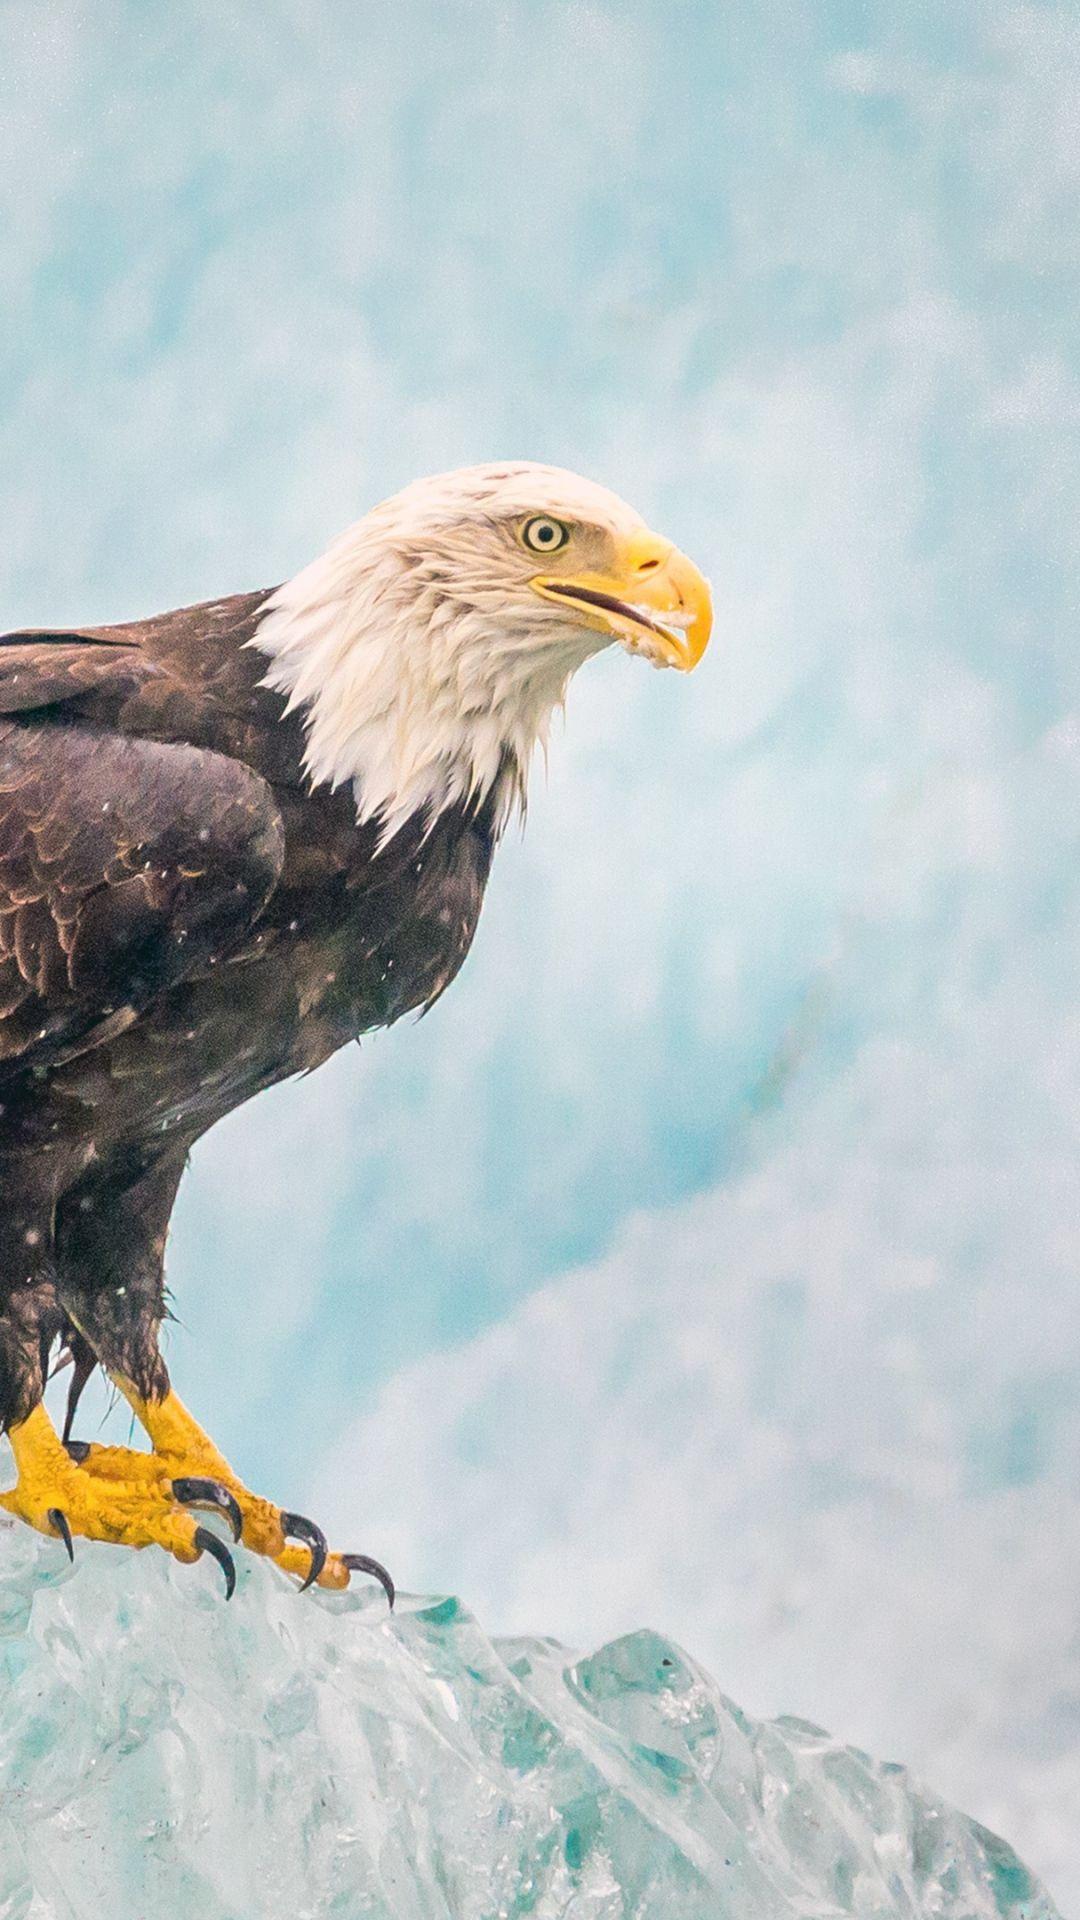 Hd Wallpaper Of Eagle